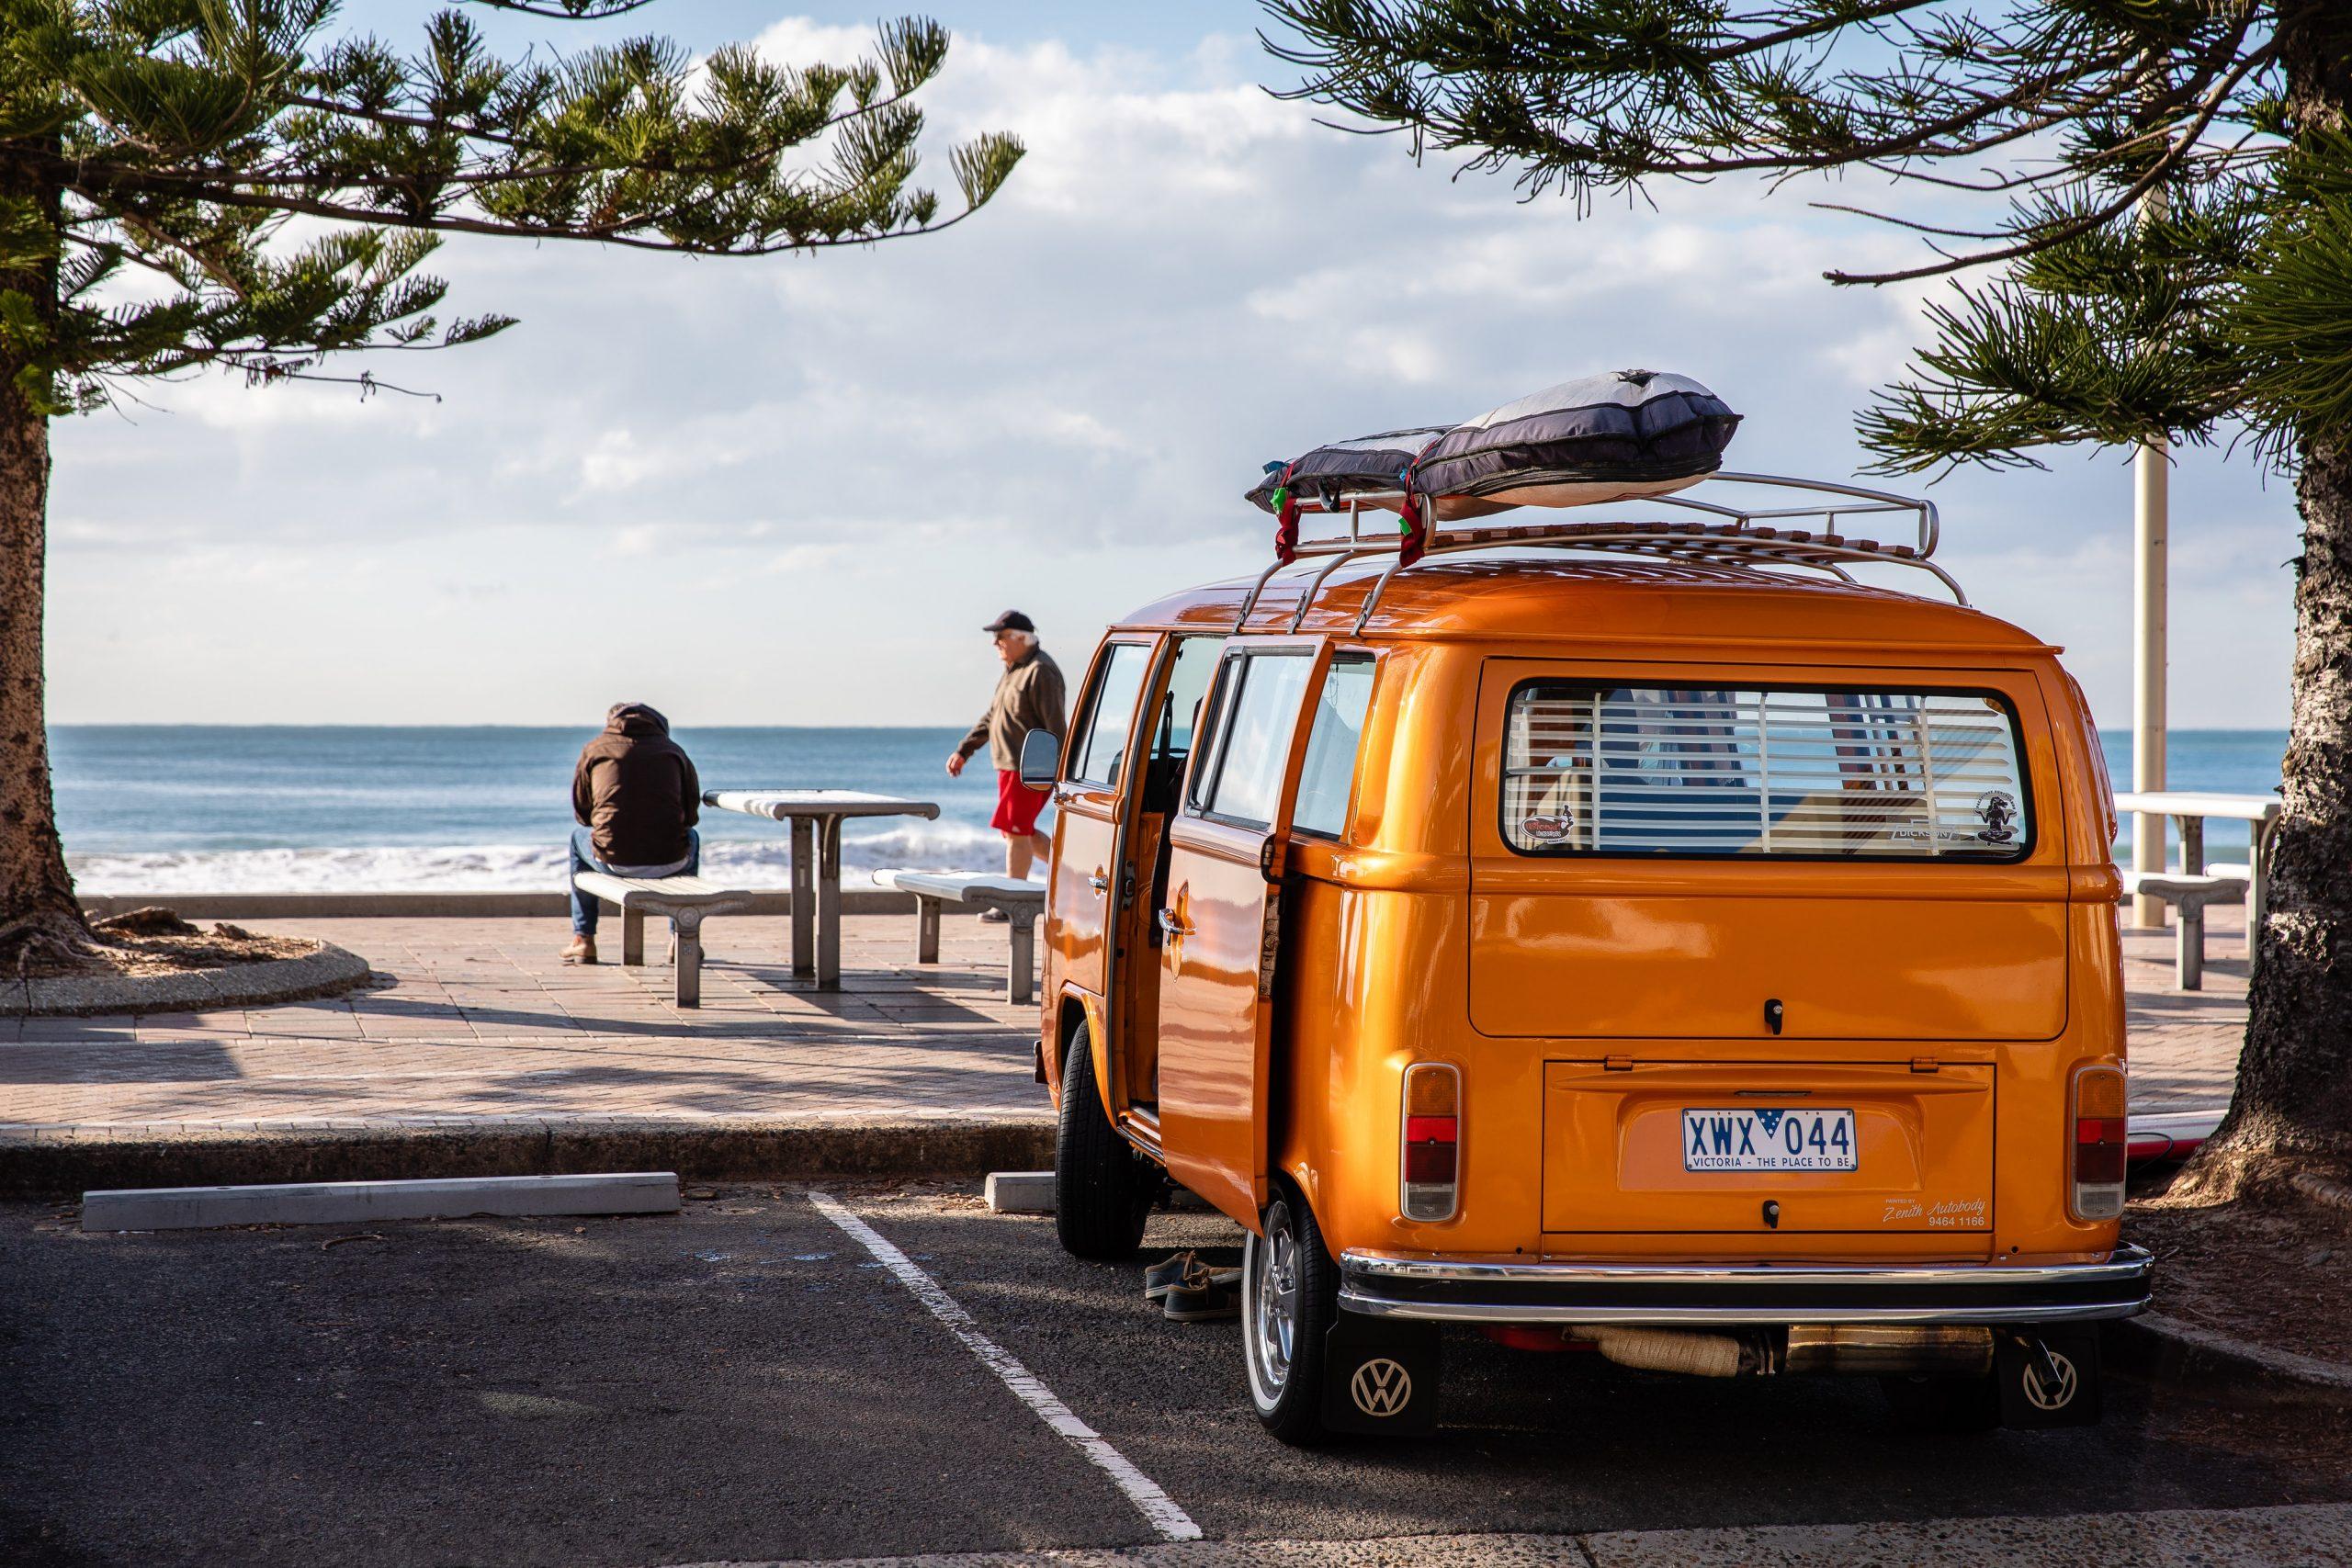 an orange campervan overlooks a beach scene